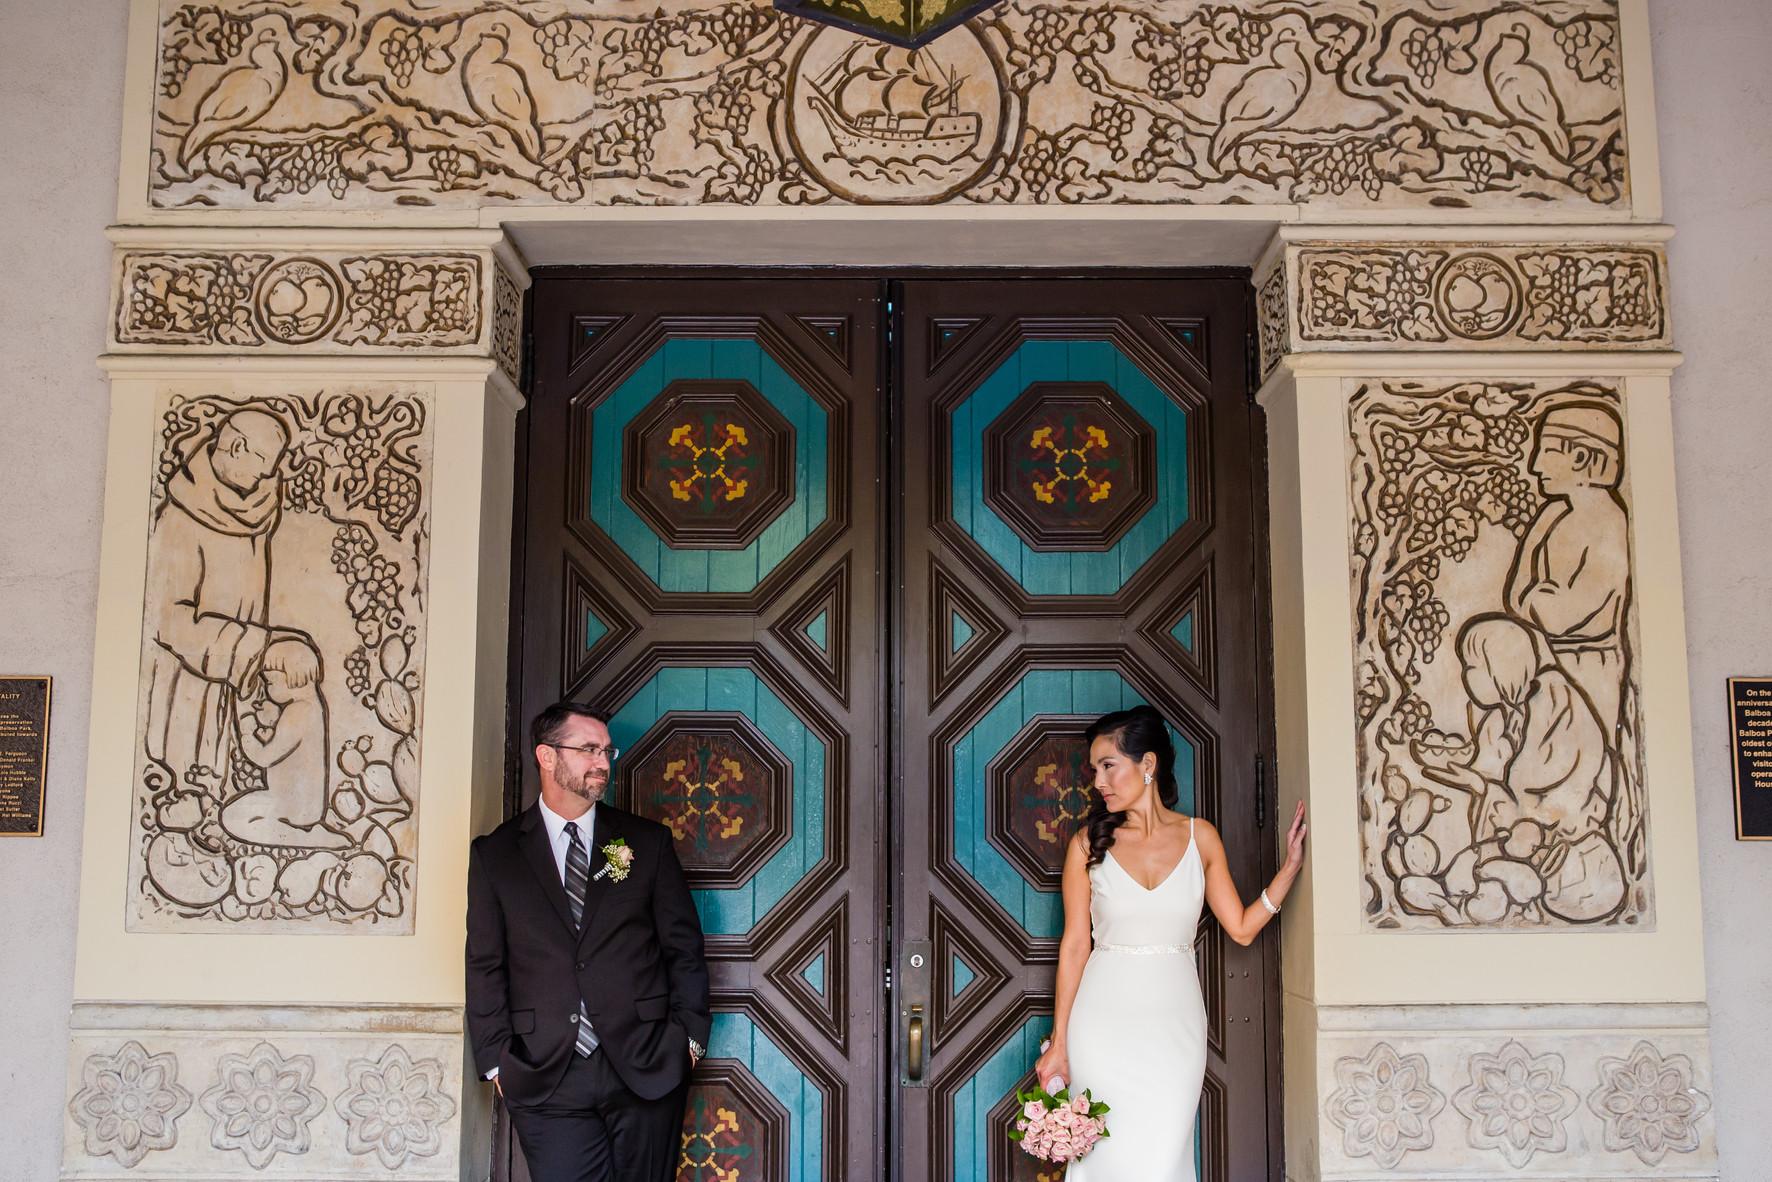 San Diego Wedding Photographer, Berlynn Photography, San Diego Wedding Photography, bride and groom at balboa park wedding